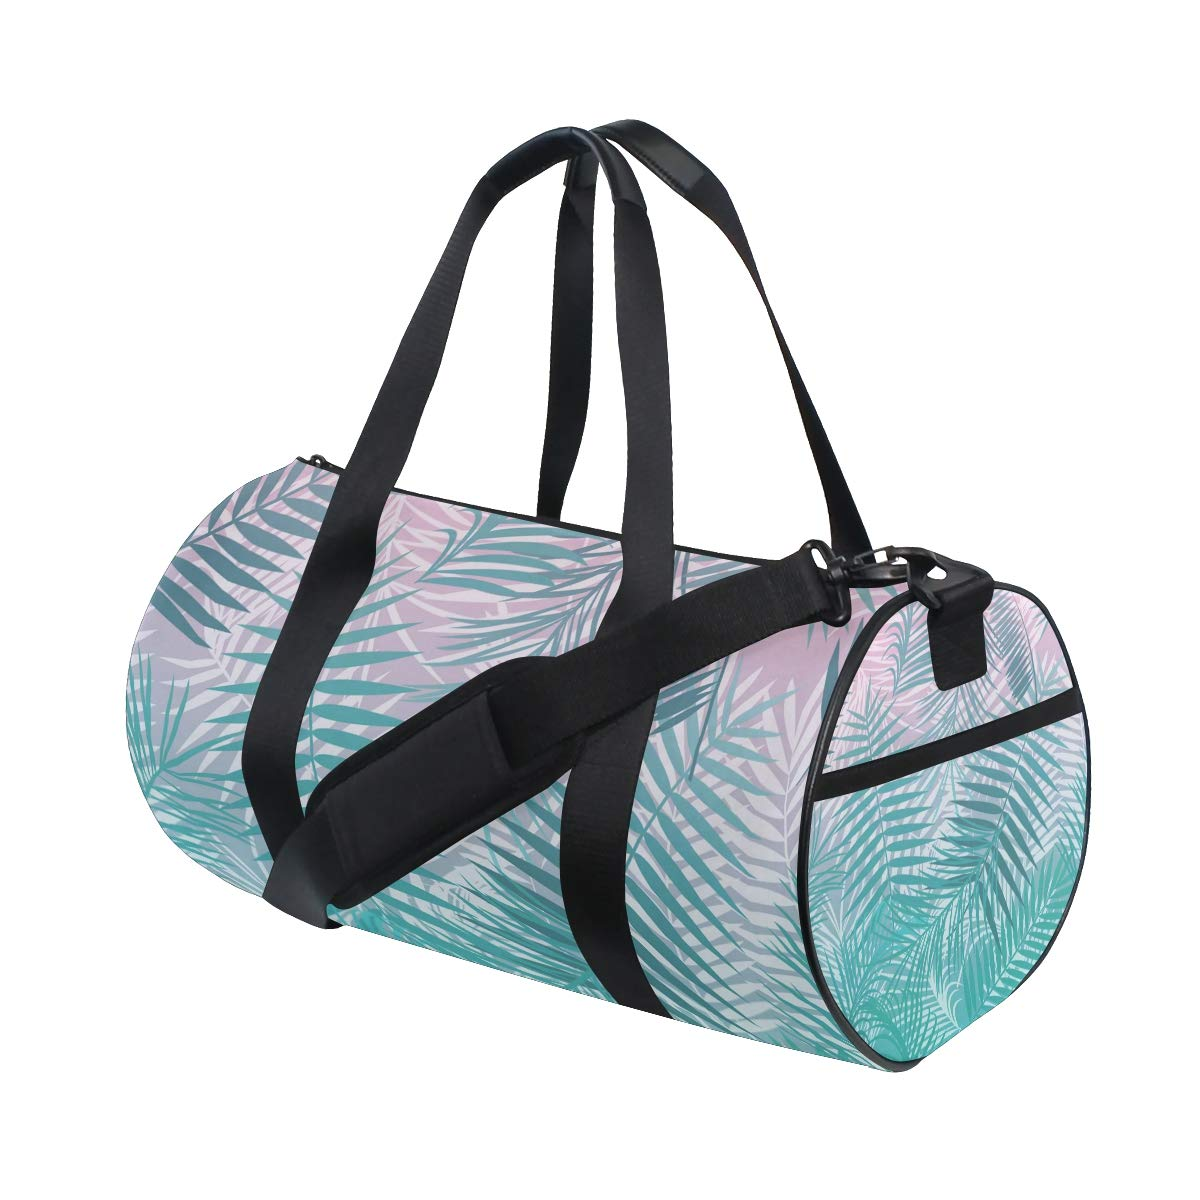 Pink Teal Fine Leaves Sports Luggage Duffel Bag Lightweight Gym Sports Shoulder Bag for Vocation Hiking, Camping